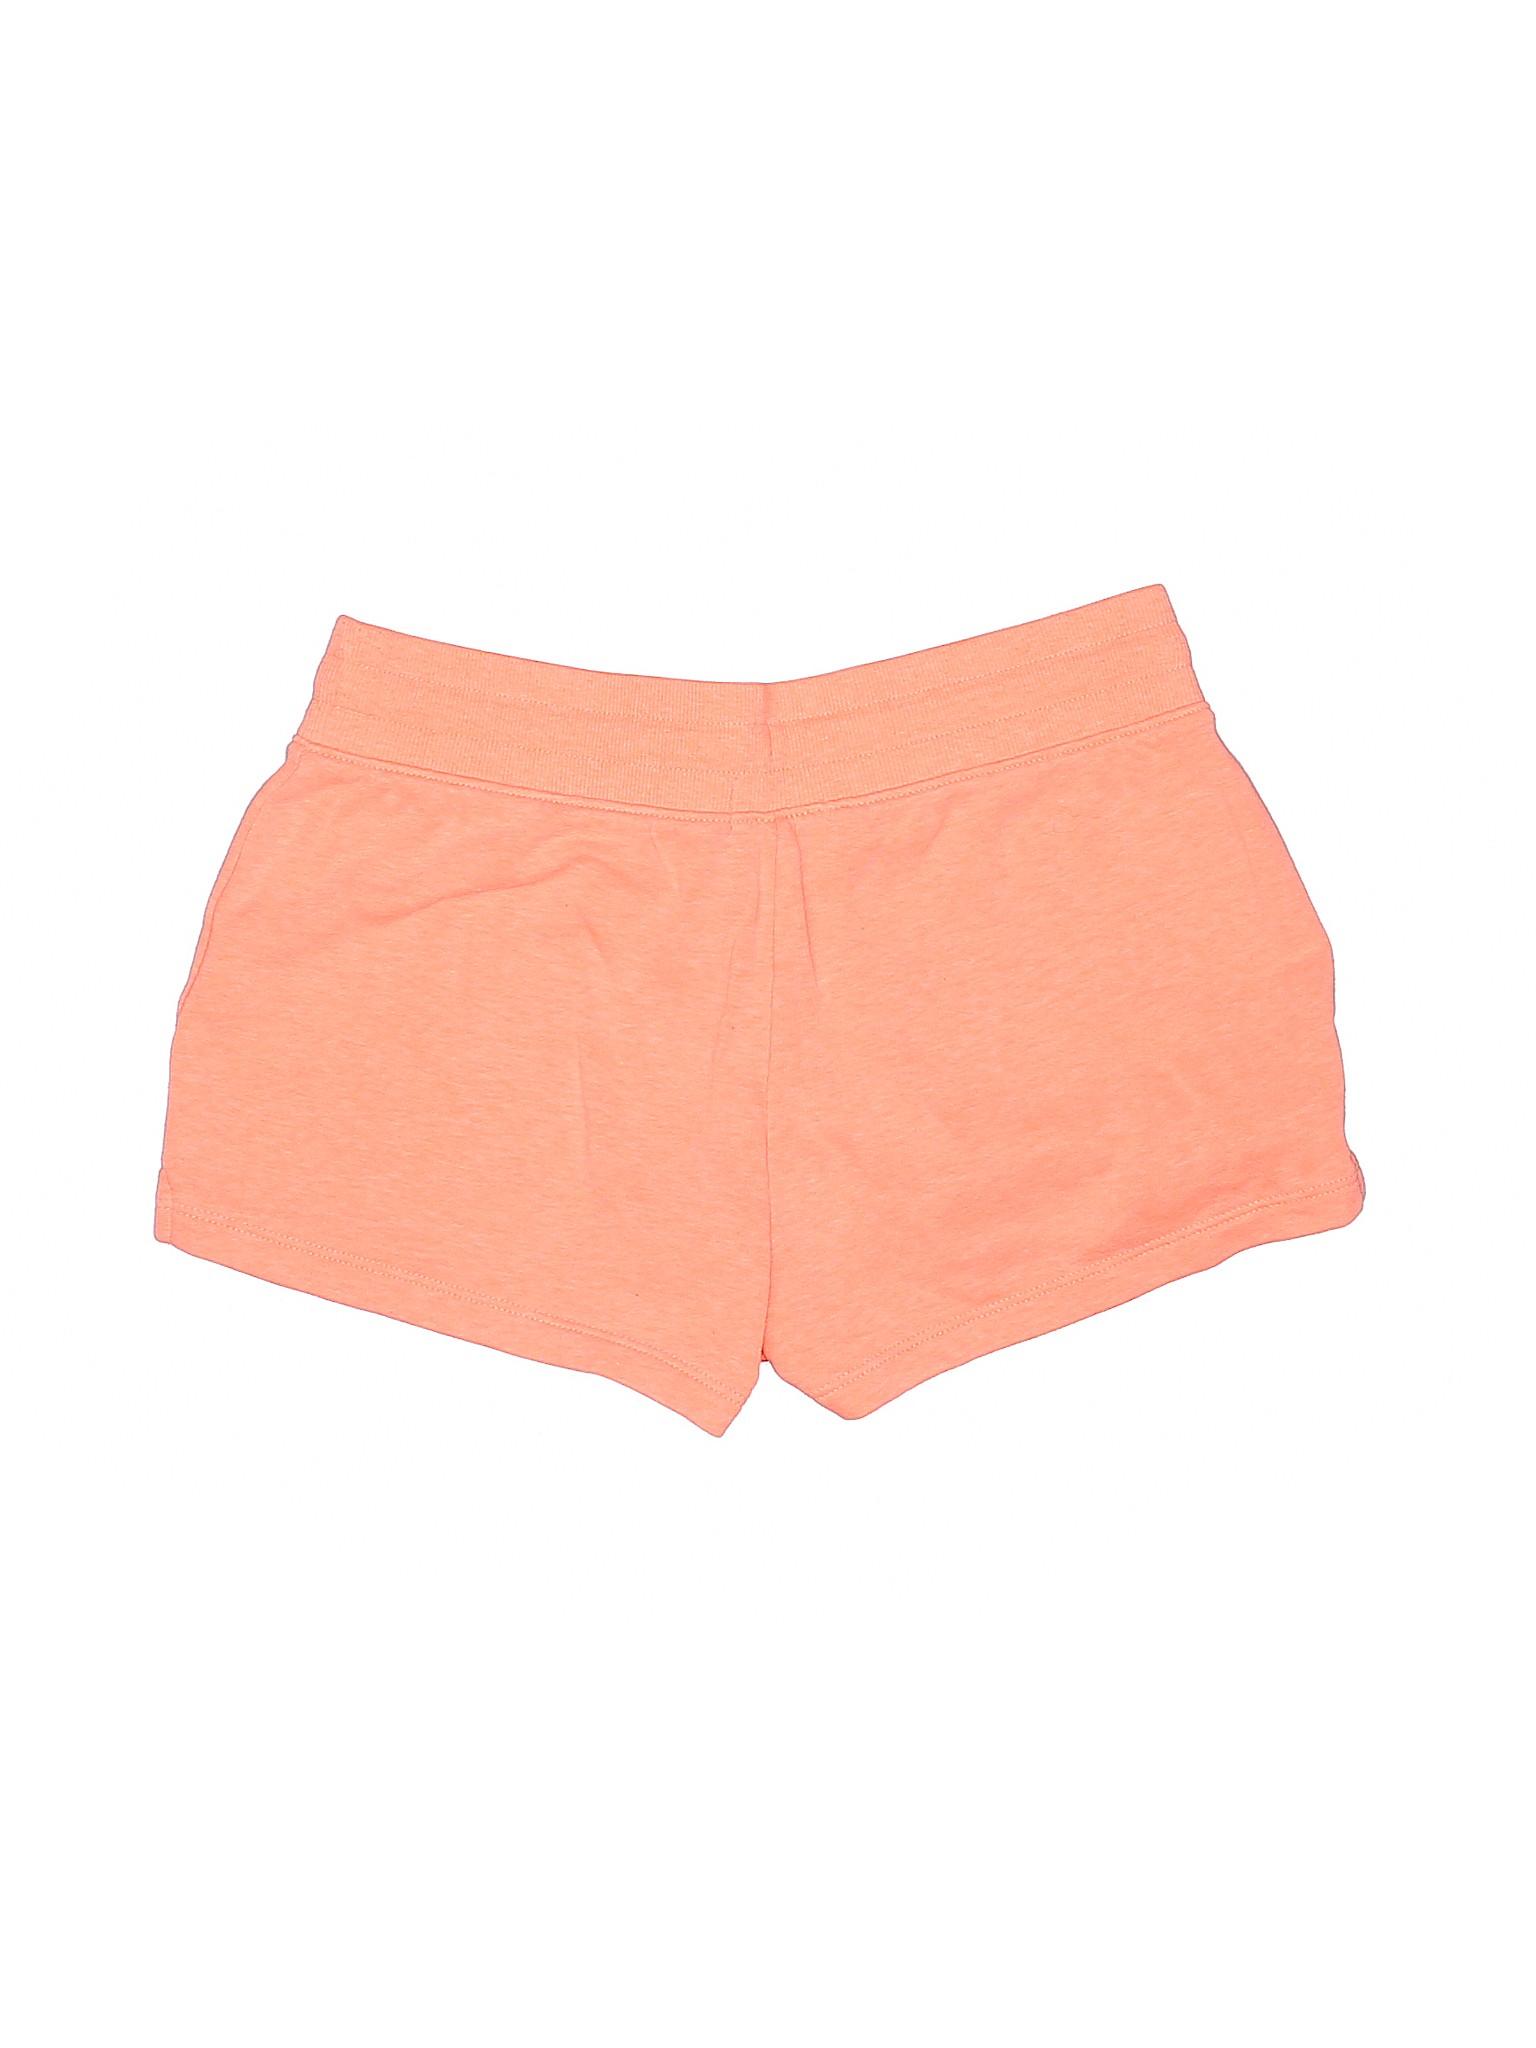 Boutique Boutique Old Shorts Navy Shorts Navy Old zwqatz0r